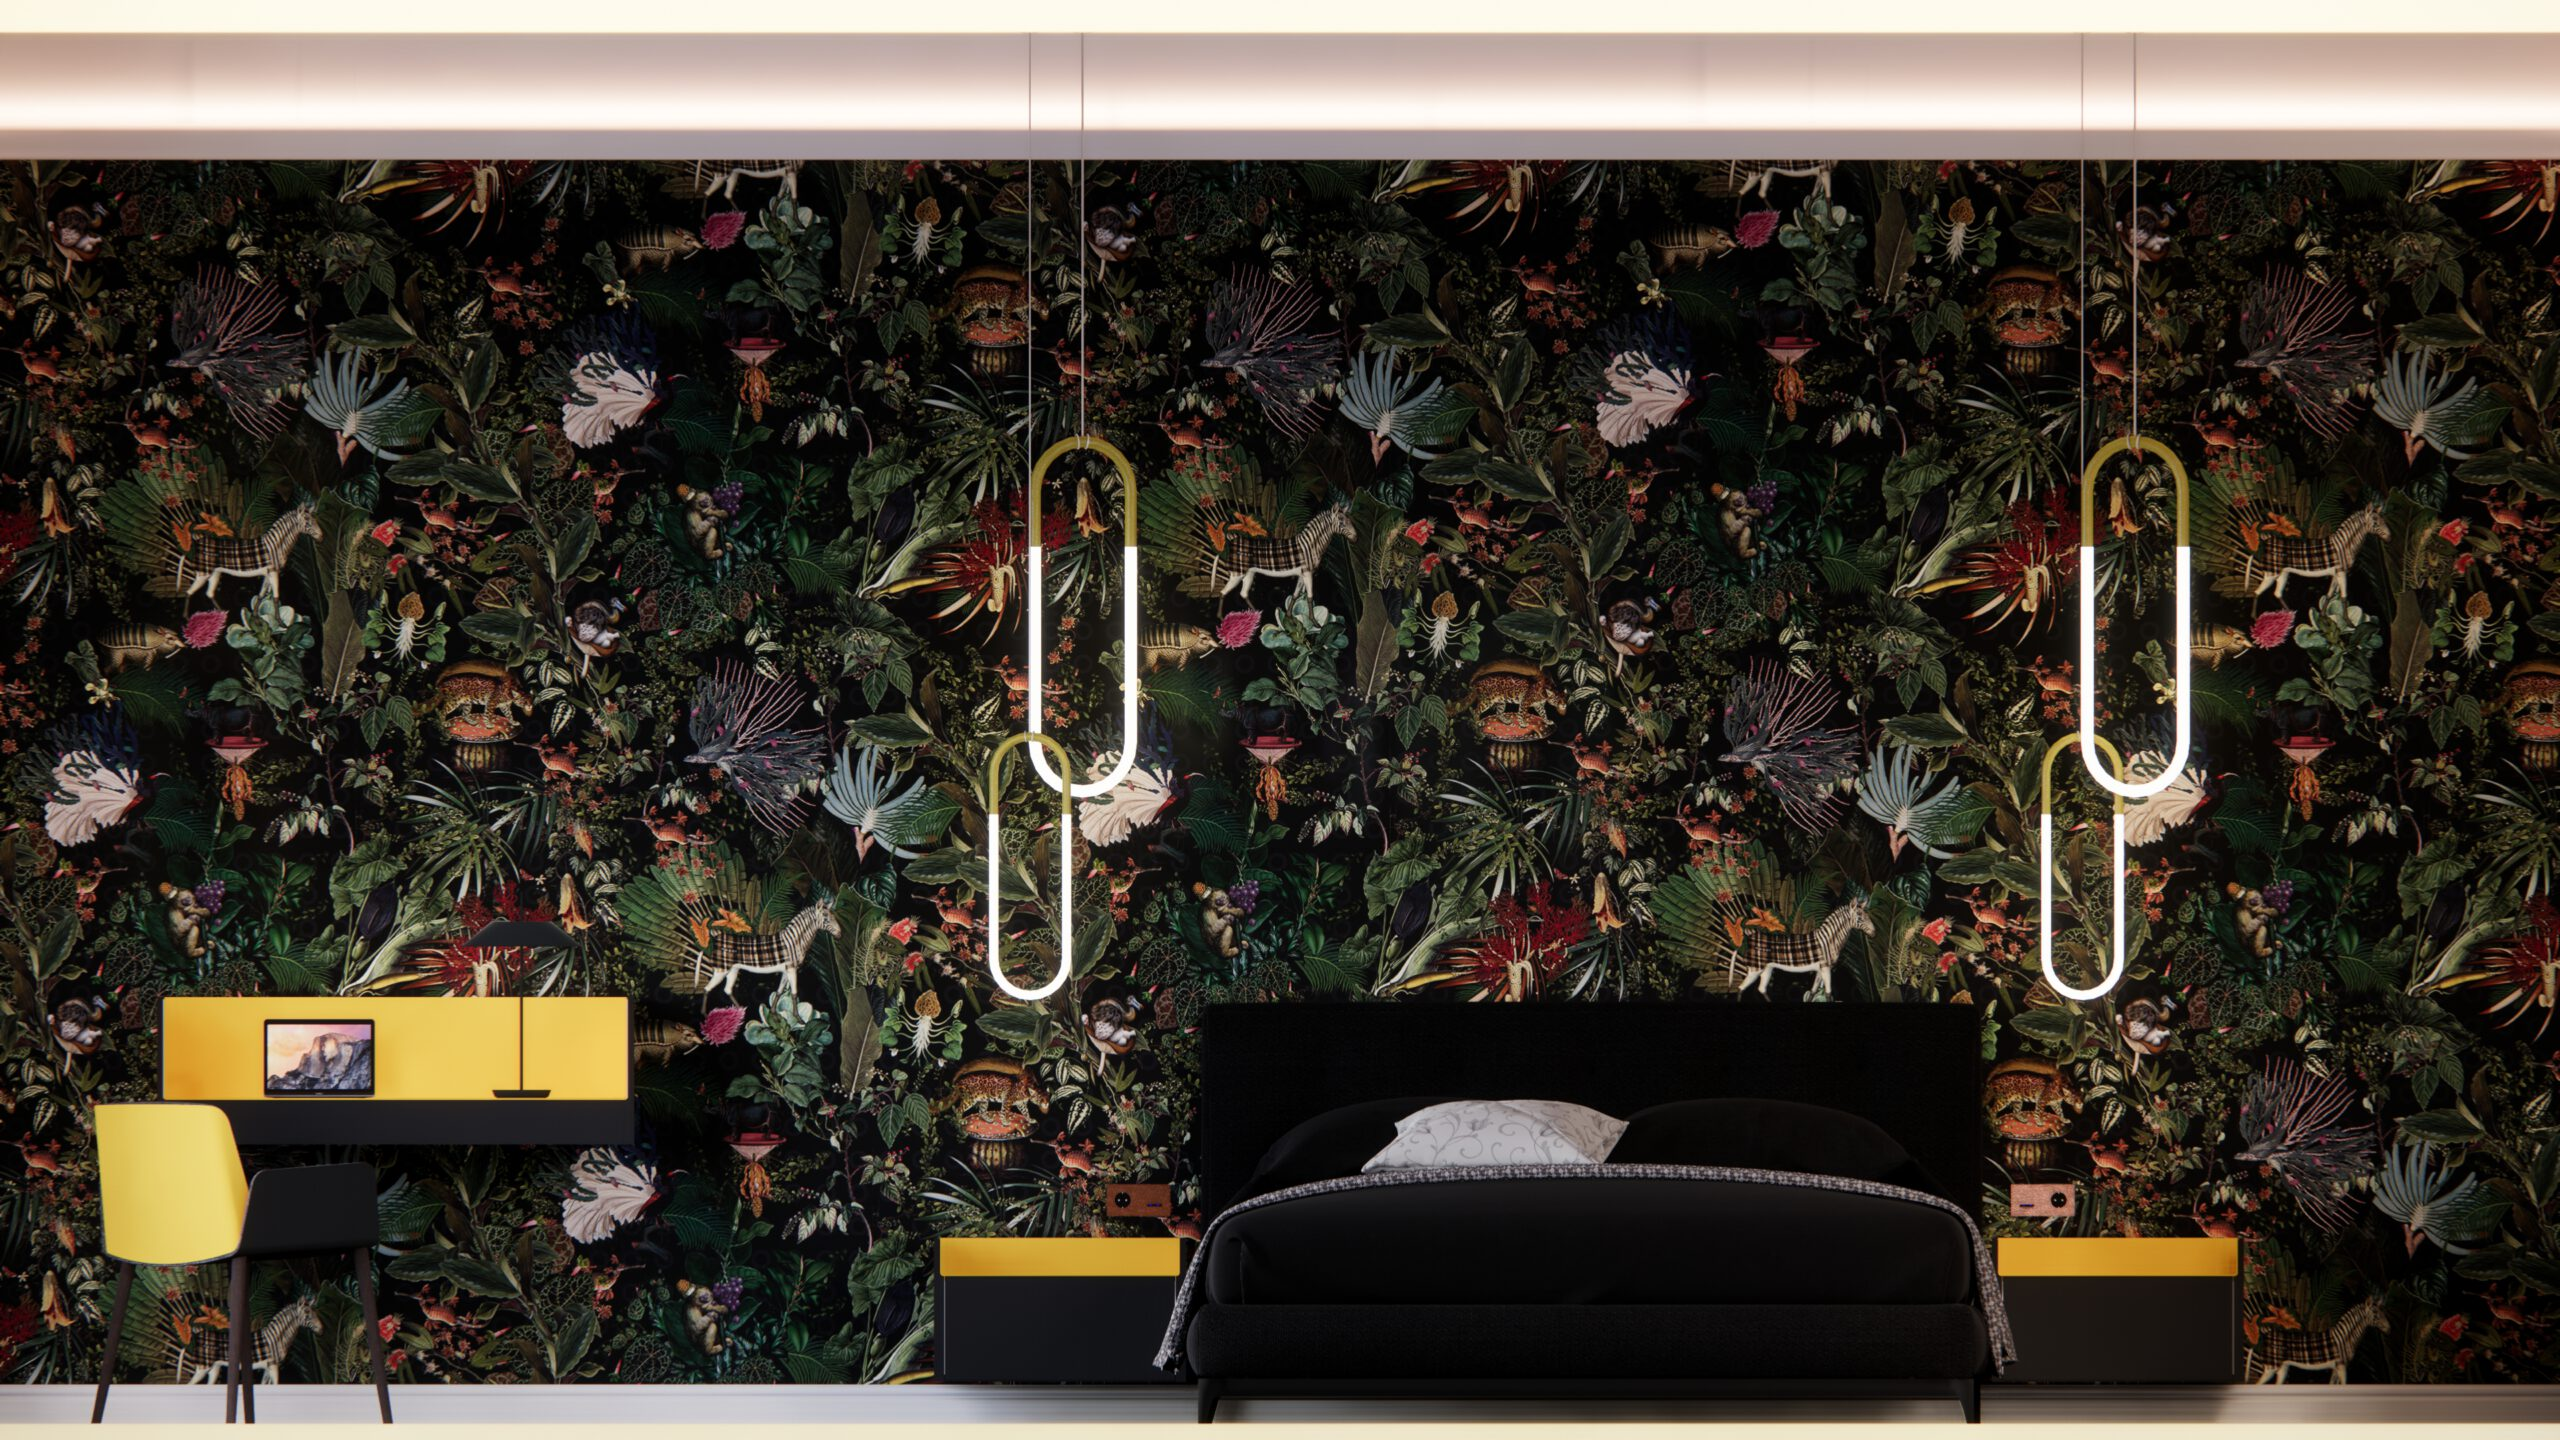 Hotelzimmer Hotel Bett Stuhl Schreibtisch Vibia Roll&Hill Basalte Tapete Arte Tepich Parkettboden Beleuchtung